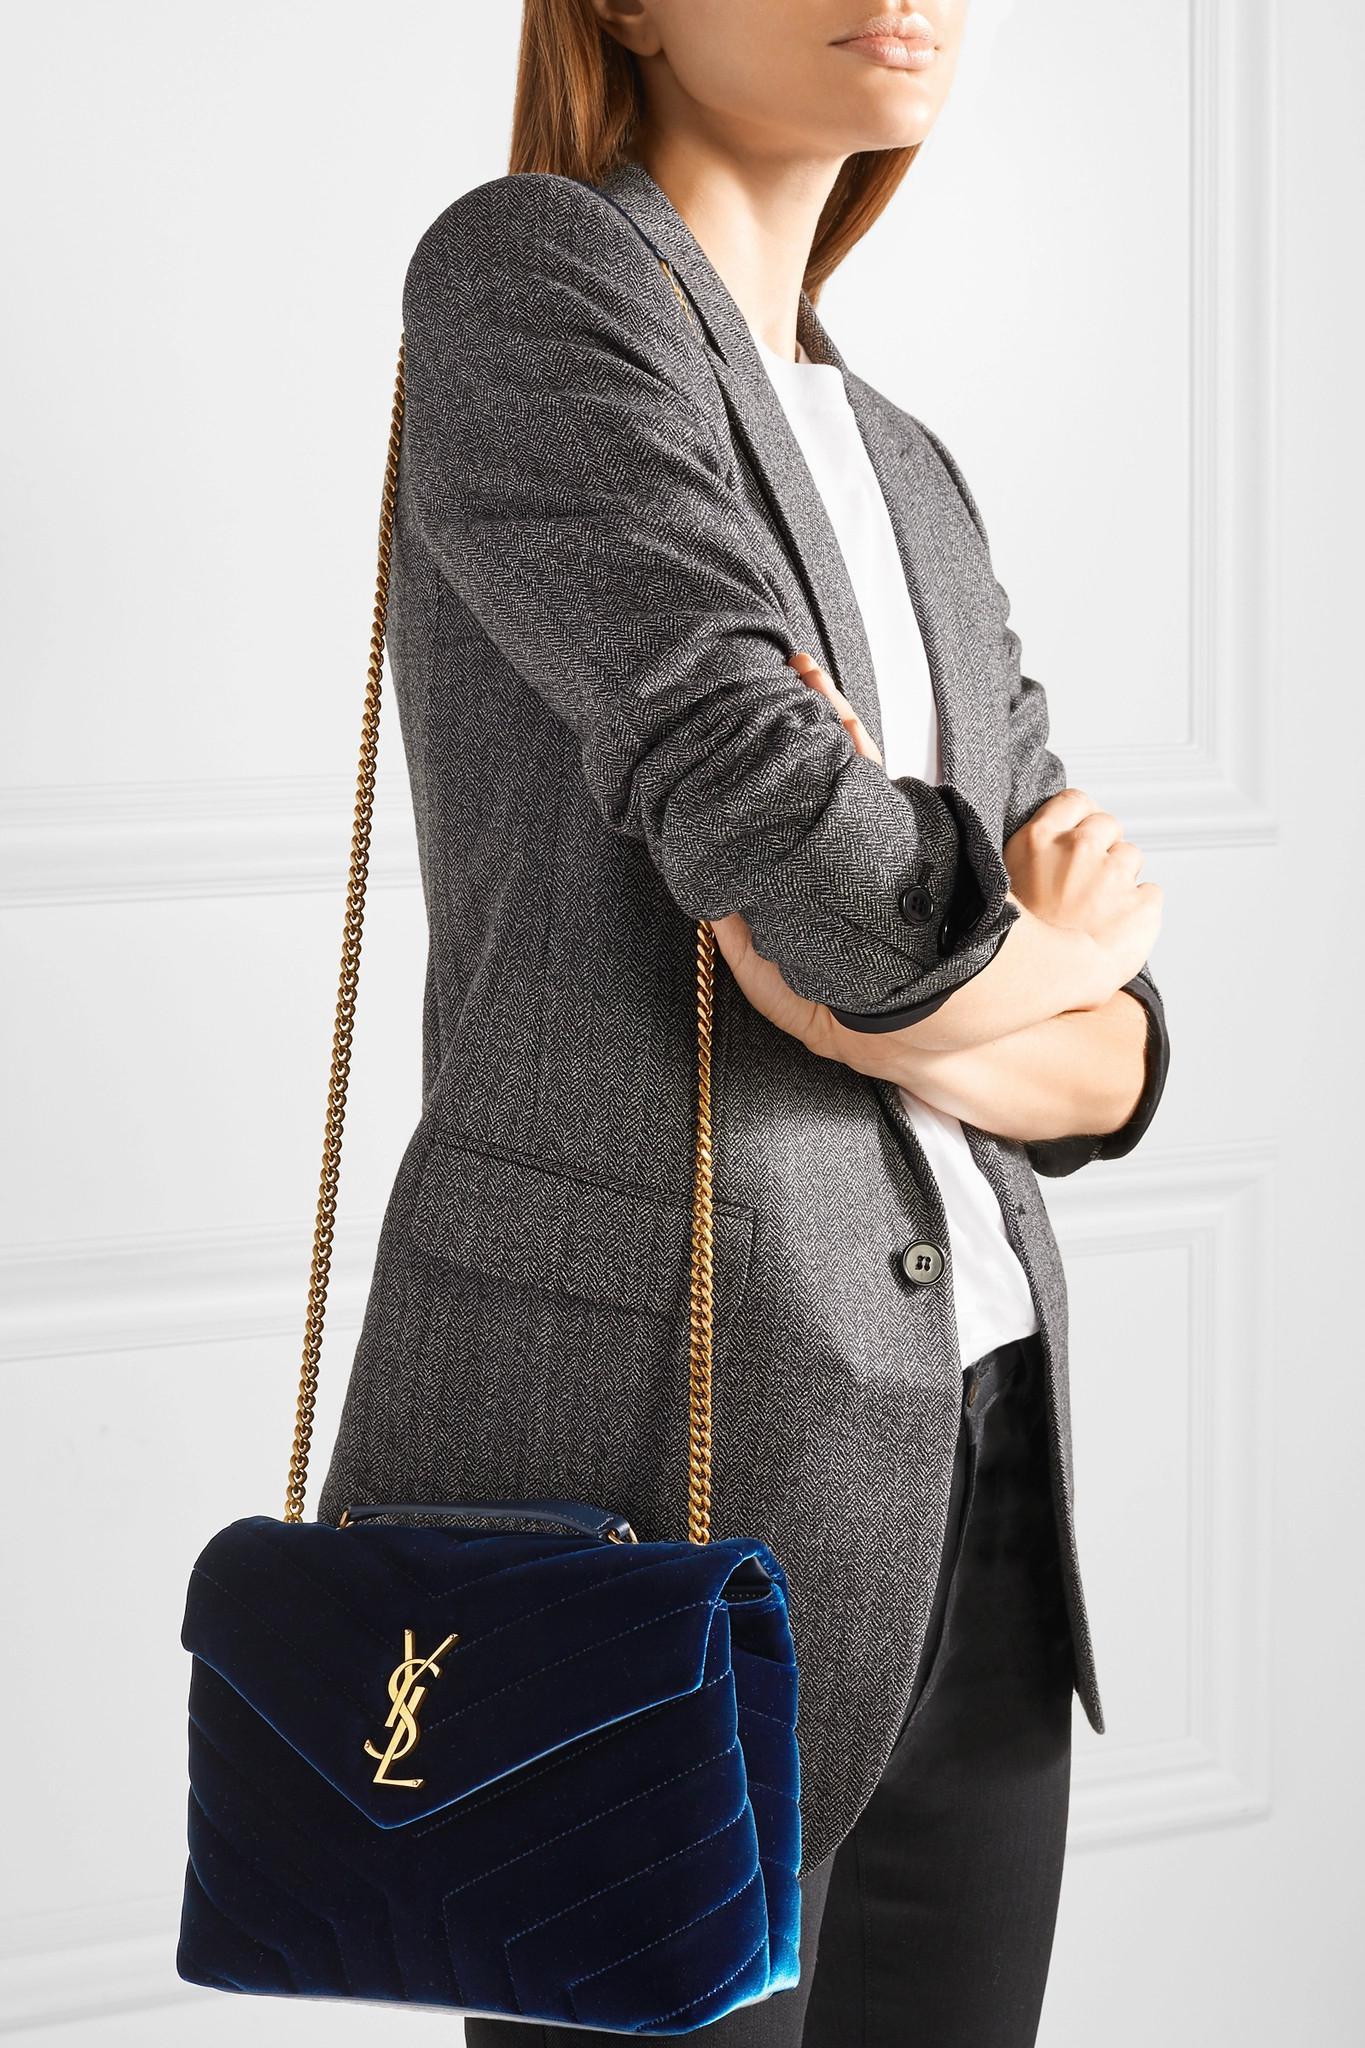 d129e19219be Lyst - Saint Laurent Loulou Small Quilted Velvet Shoulder Bag in Blue